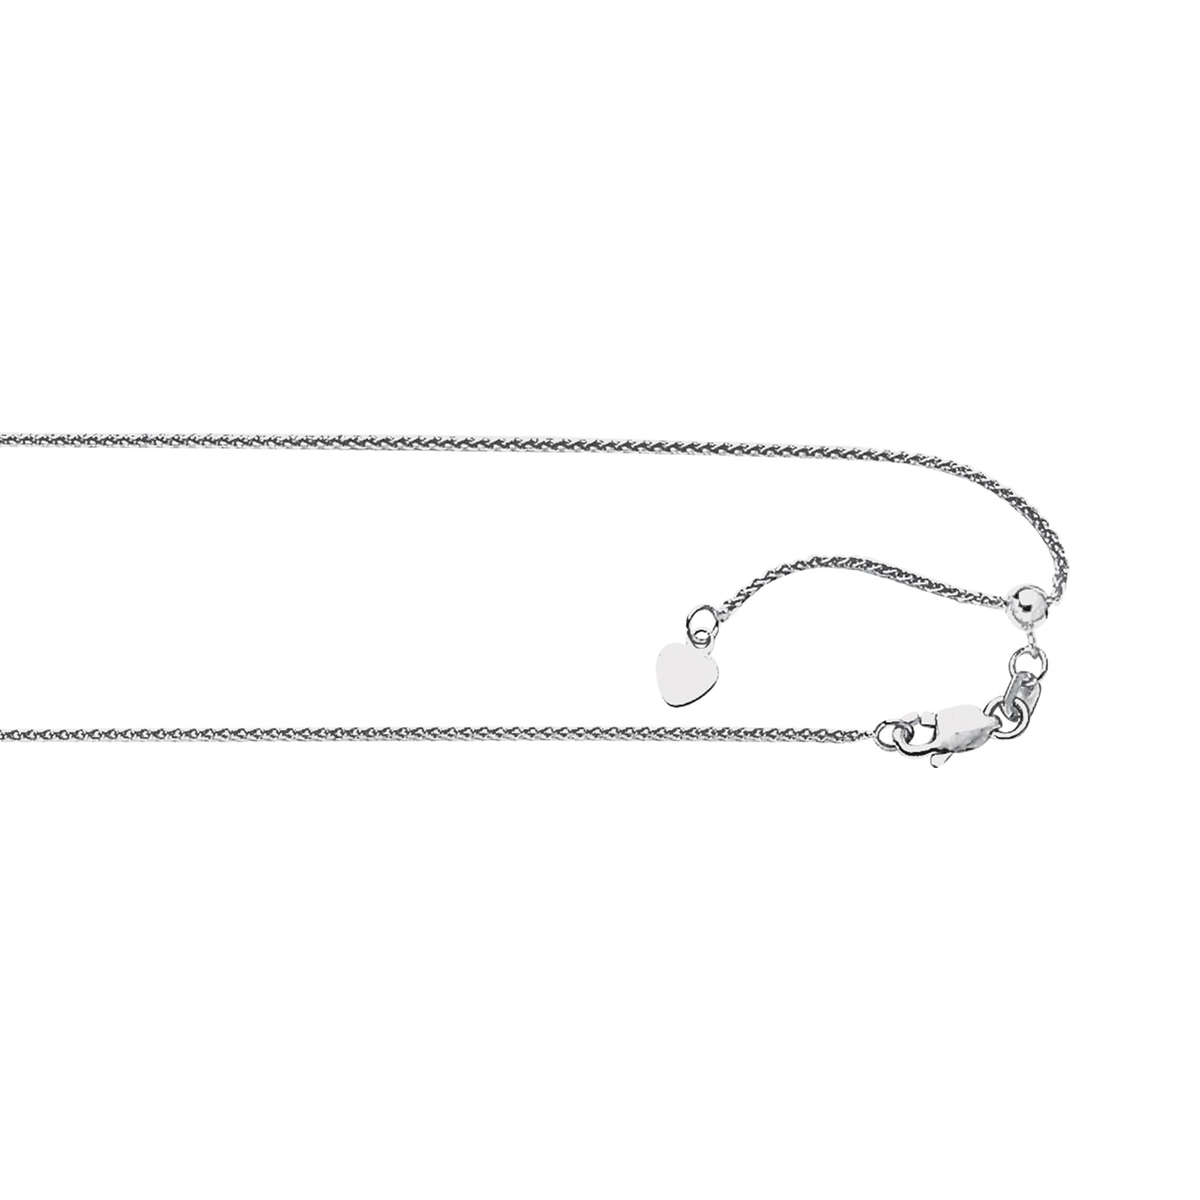 Royal Chain Sterling Silver 1.0mm Rhodium Adjustable Spiga Chain